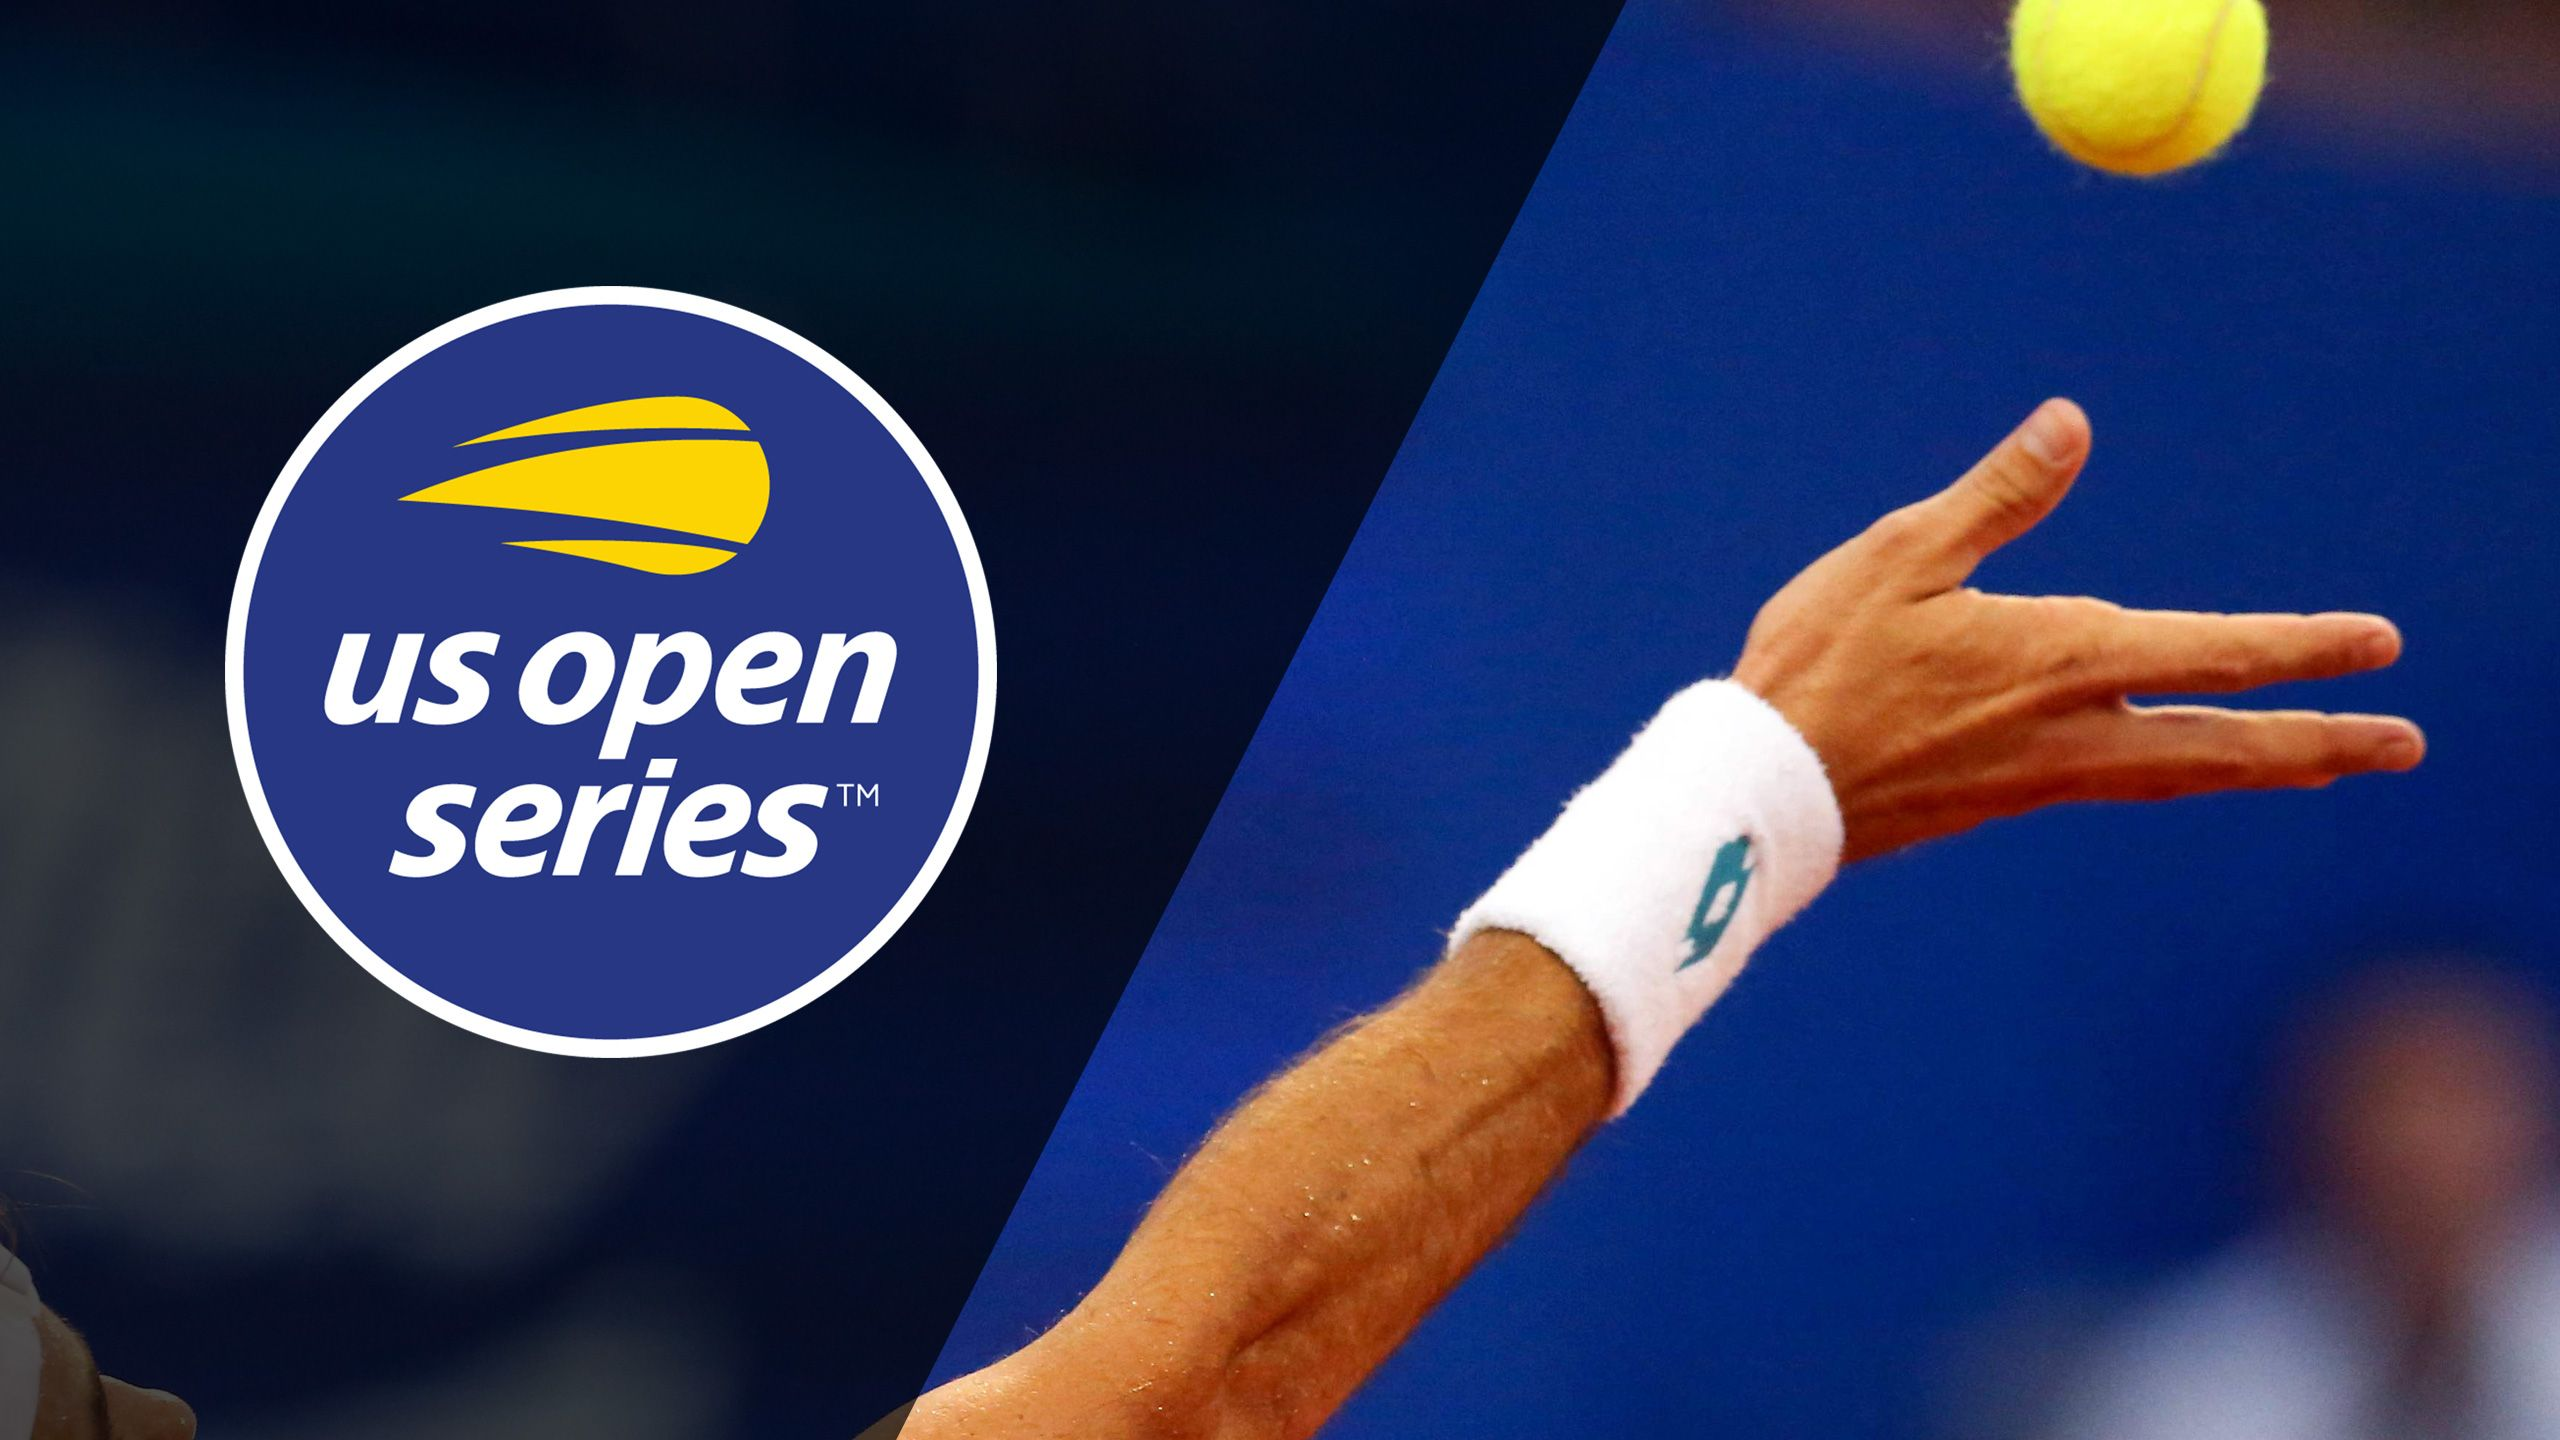 2018 US Open Series - BB&T Atlanta Open (Quarterfinals #1, #2 & #3)